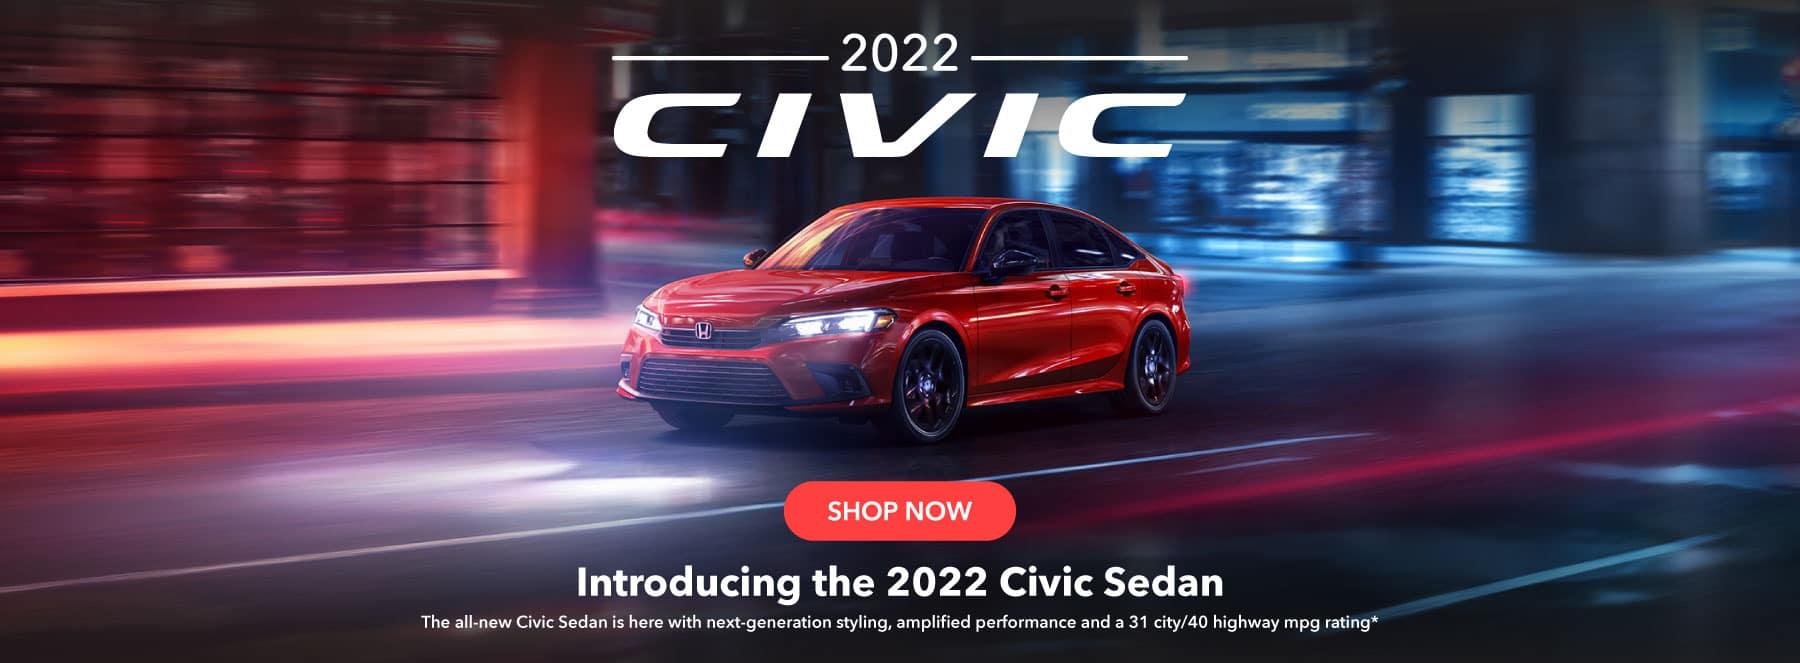 Introducing the 2022 Civic Sedan